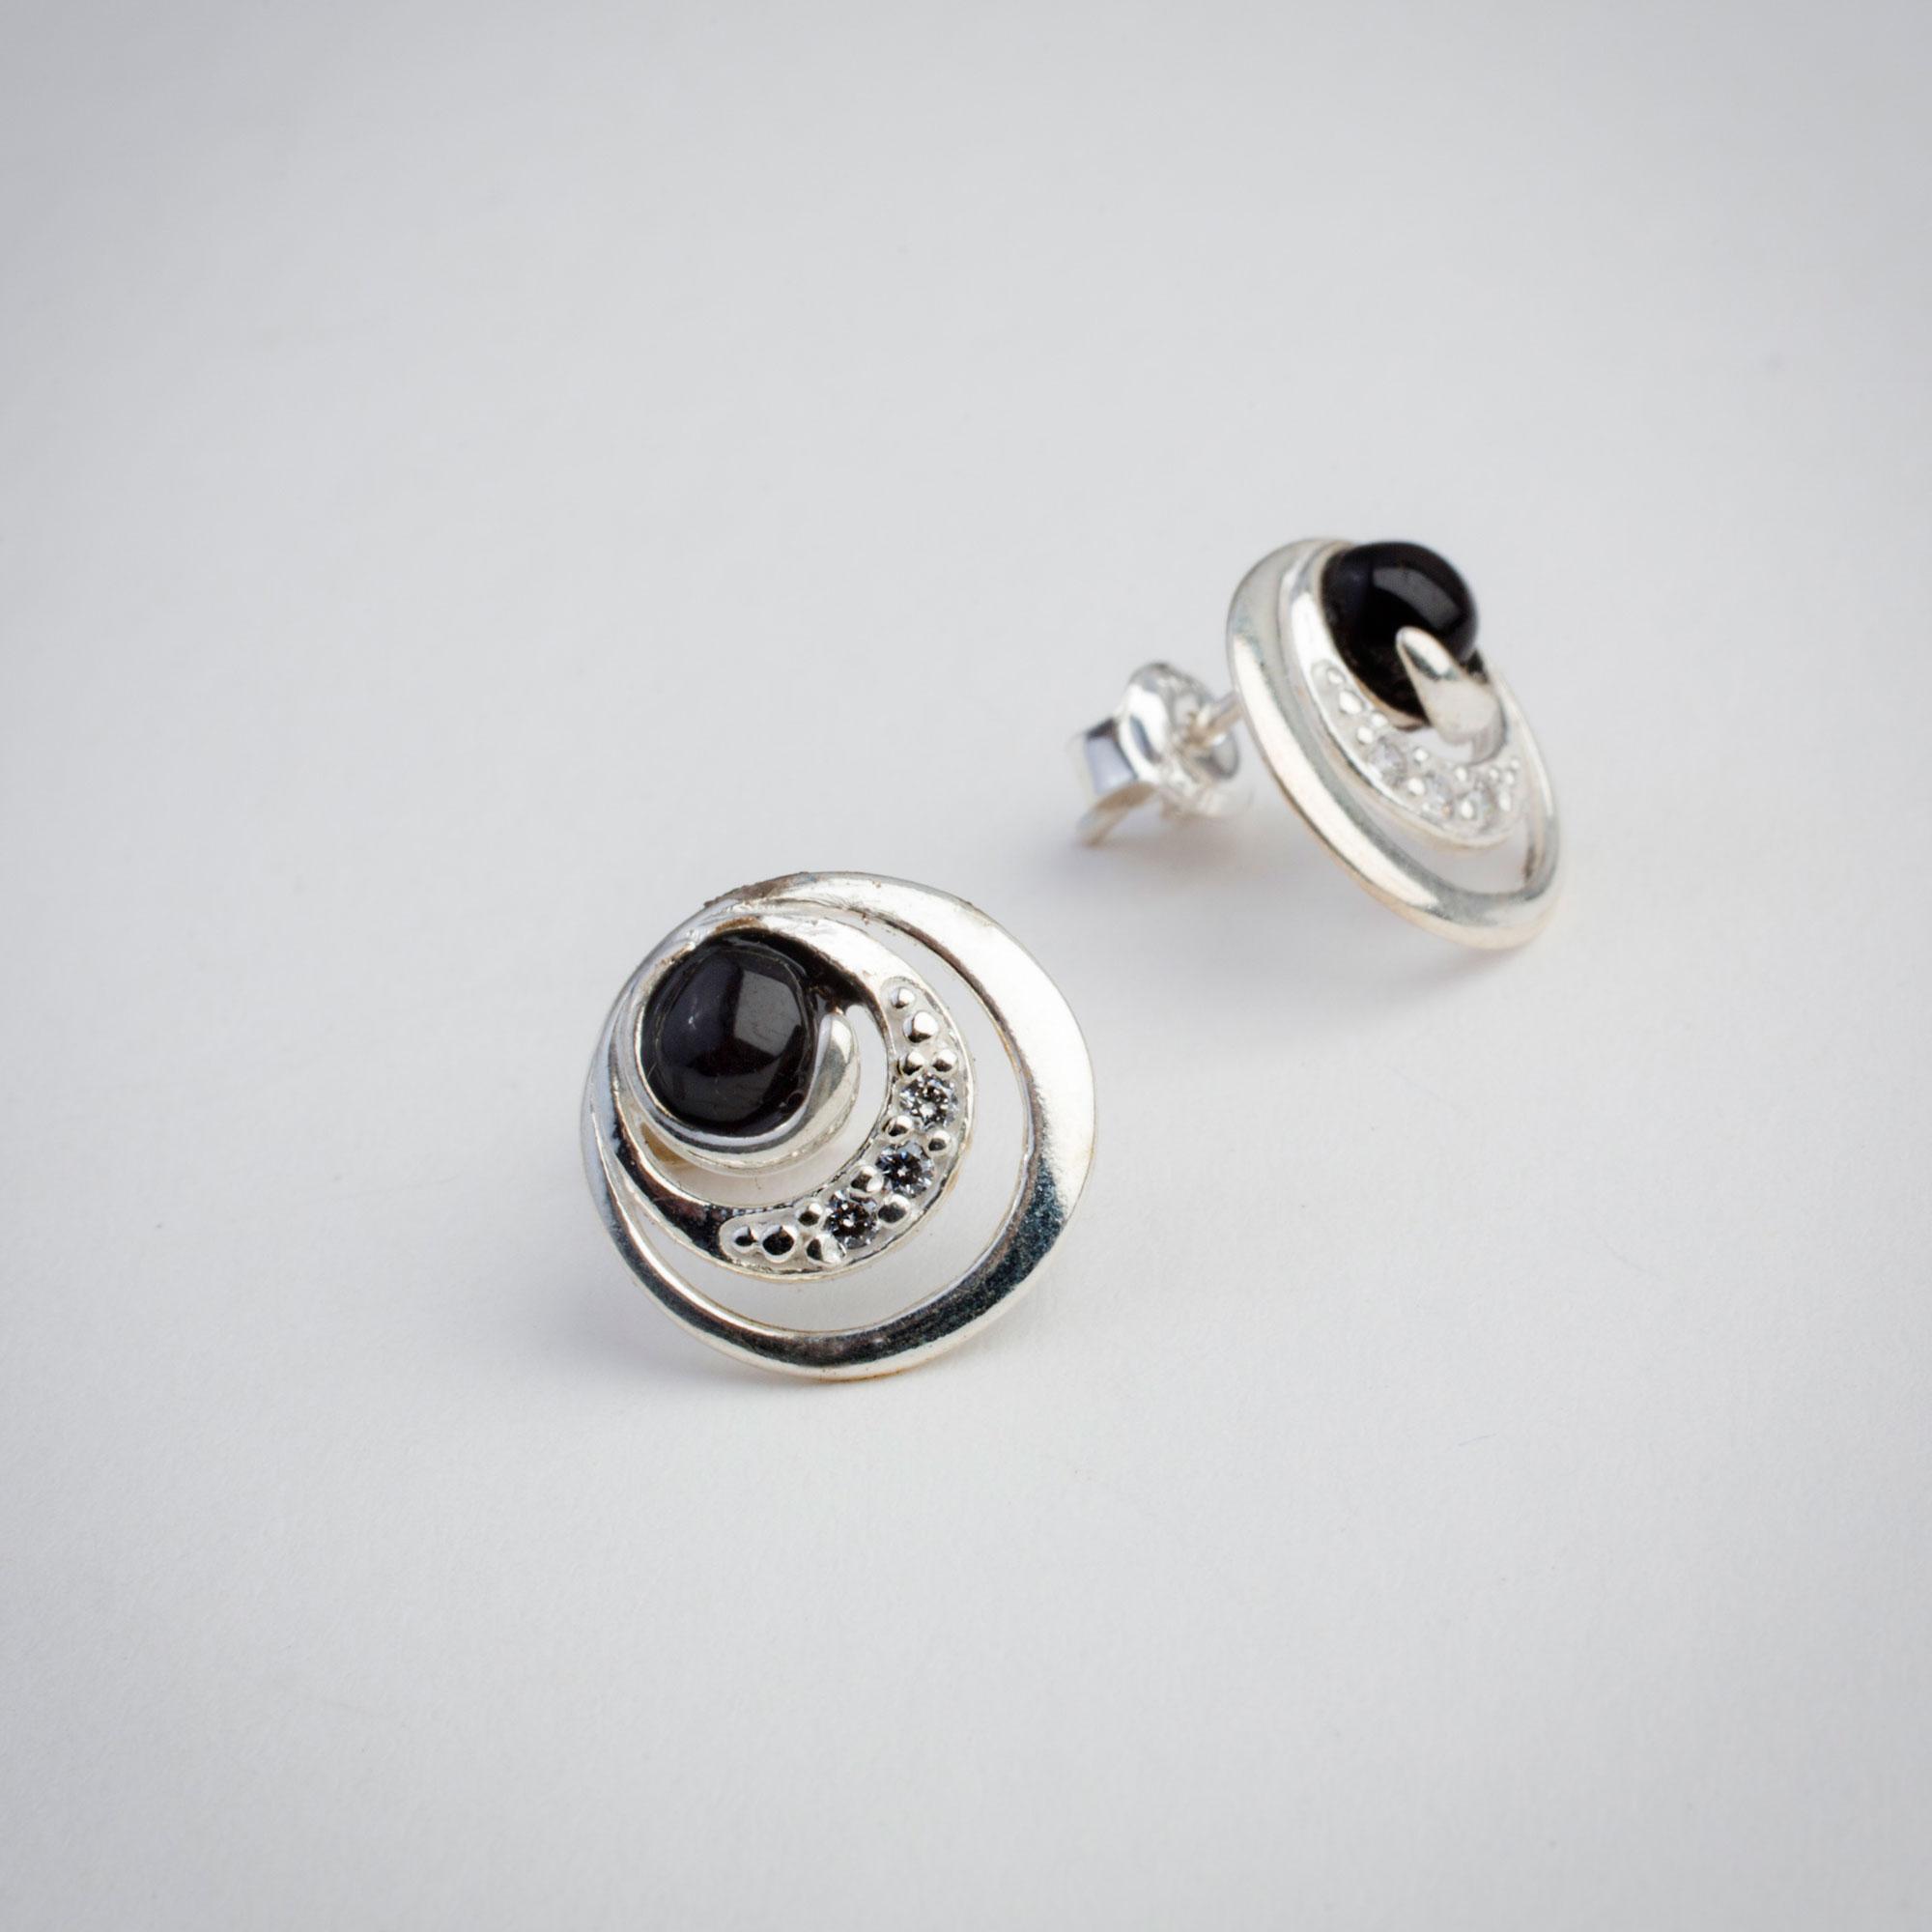 whitby-jet-jewellery4.jpg